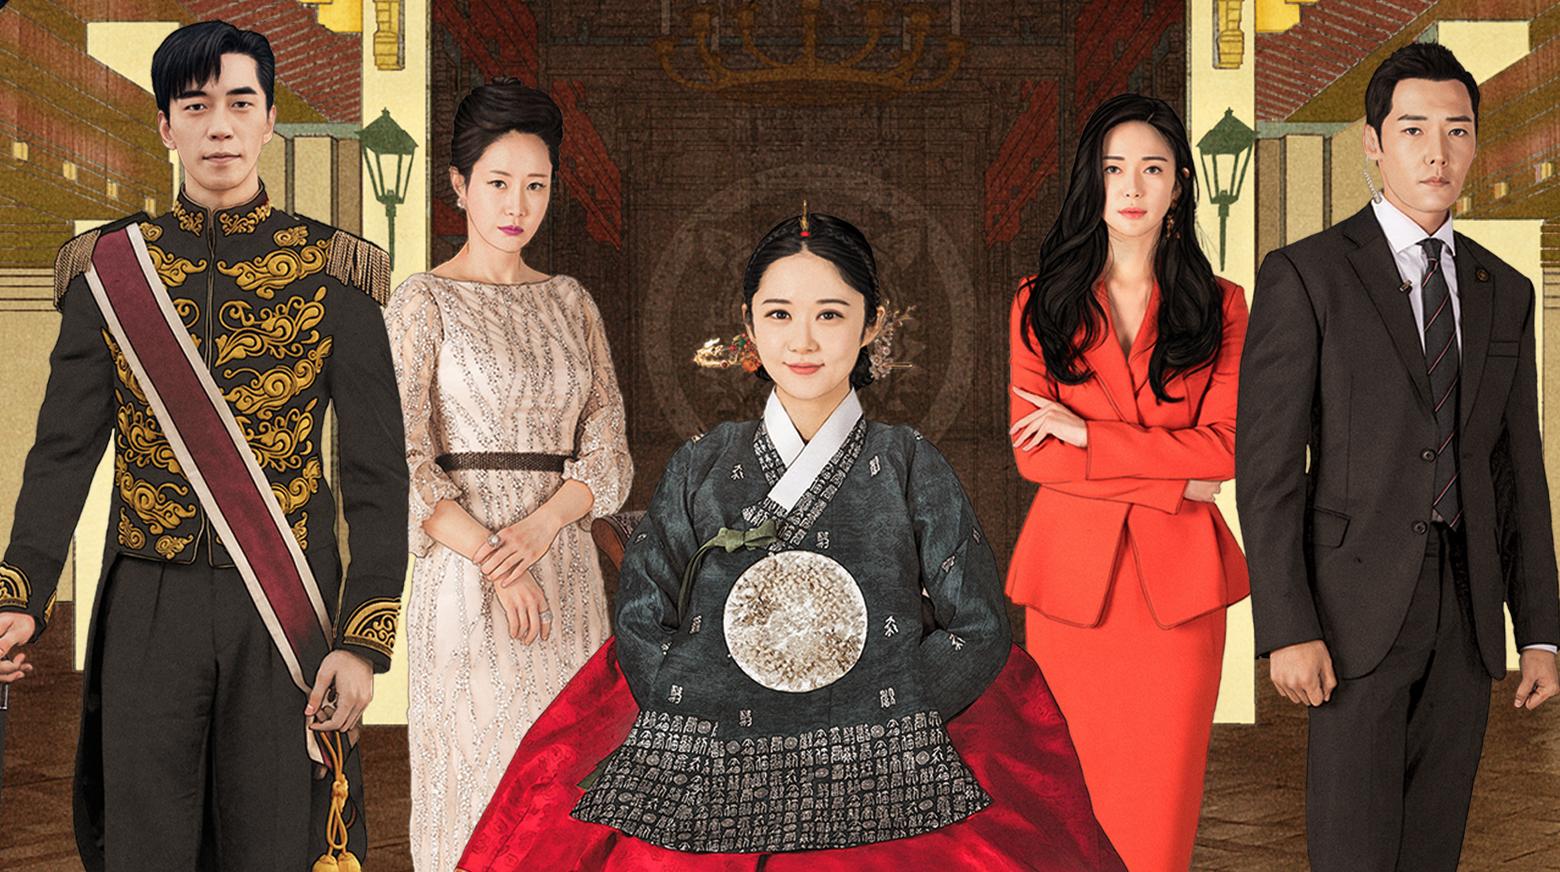 The Last Empress Episode   Ed  A Ed B  Ec D   Ed   Ea B A Watch Full Episodes Free Korea Tv Shows Rakuten Viki